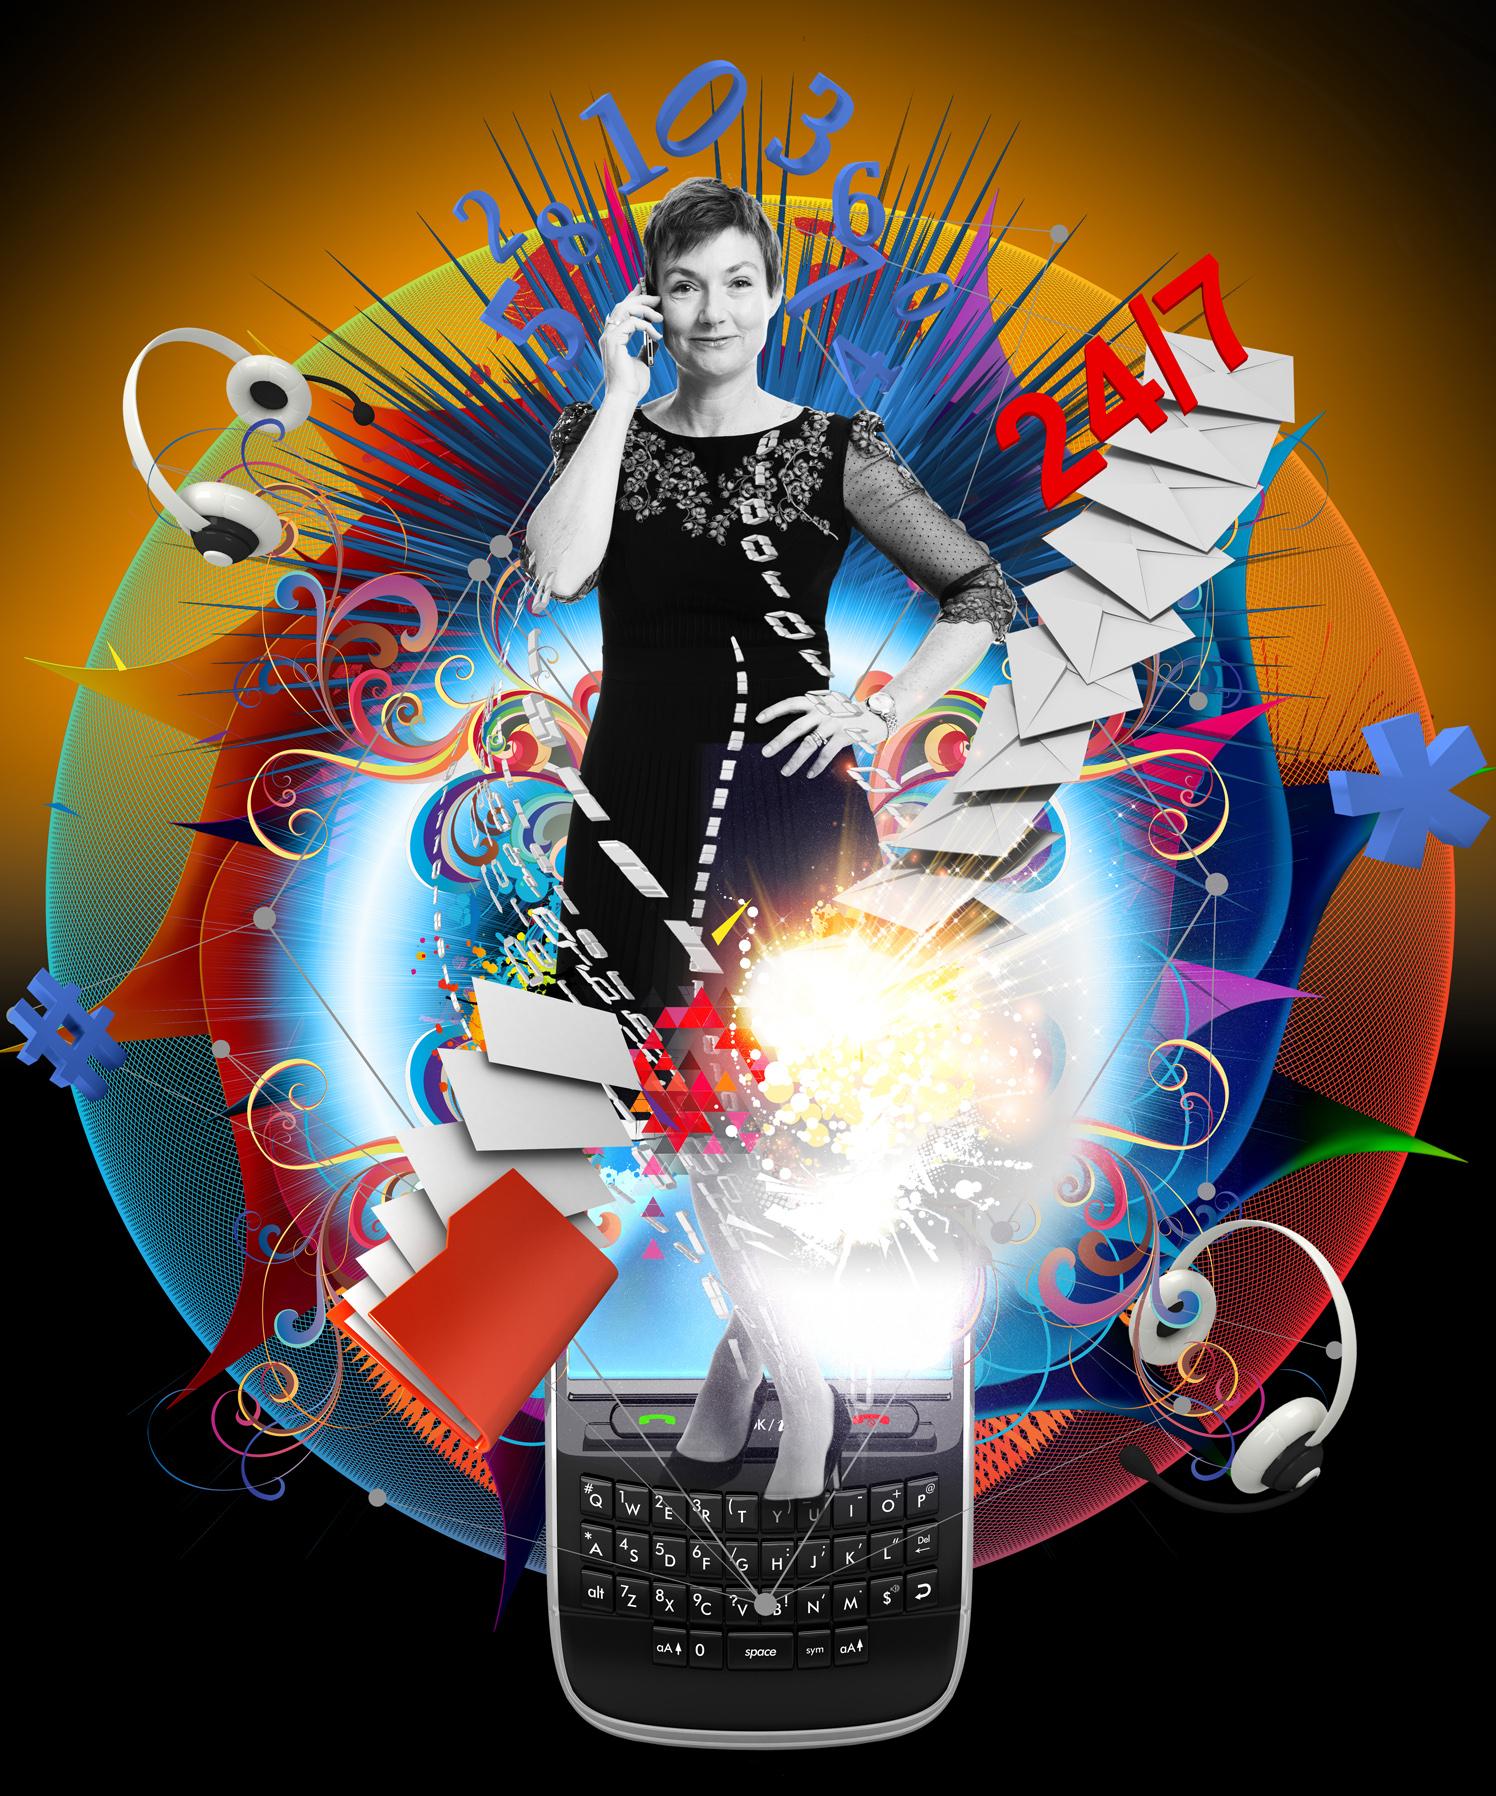 Rachel Clacher / Virtual Business